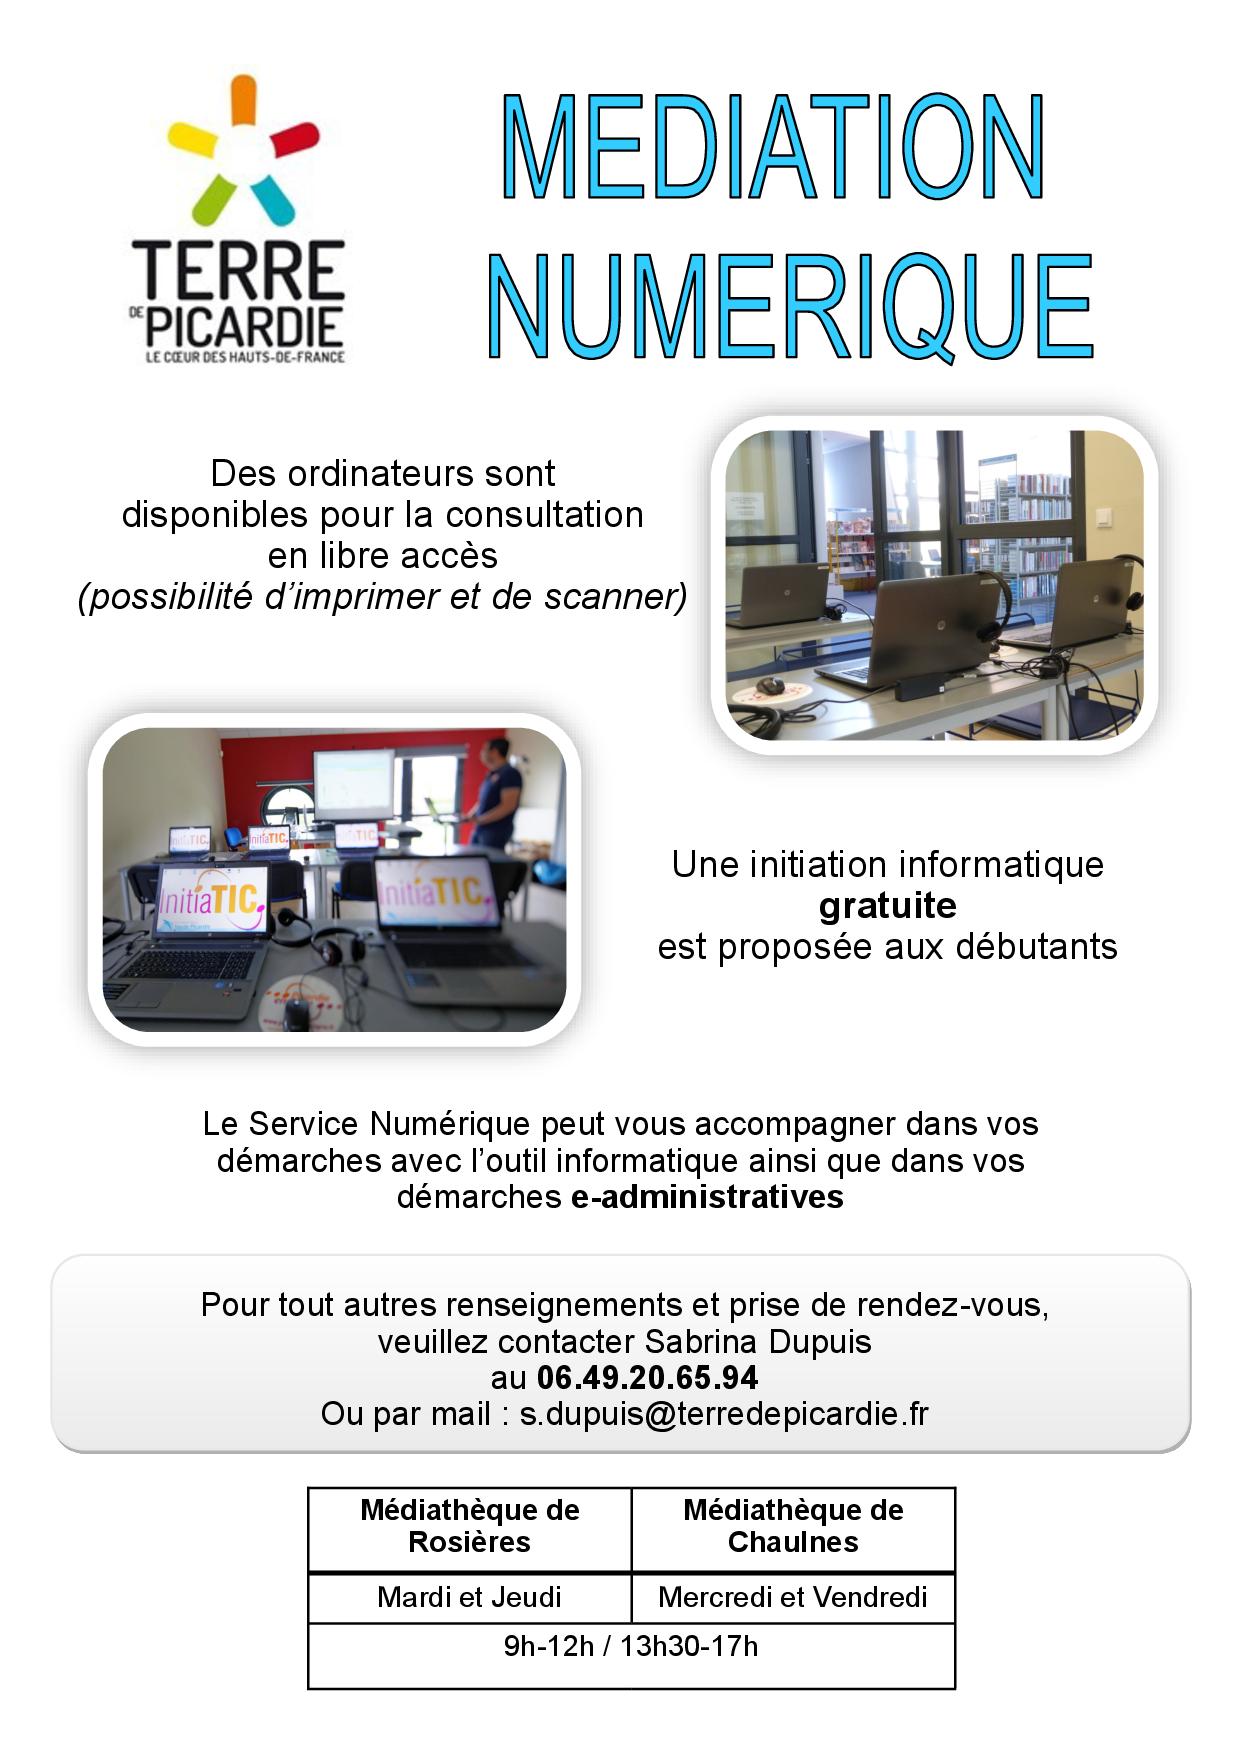 Aide démarches e-administratives